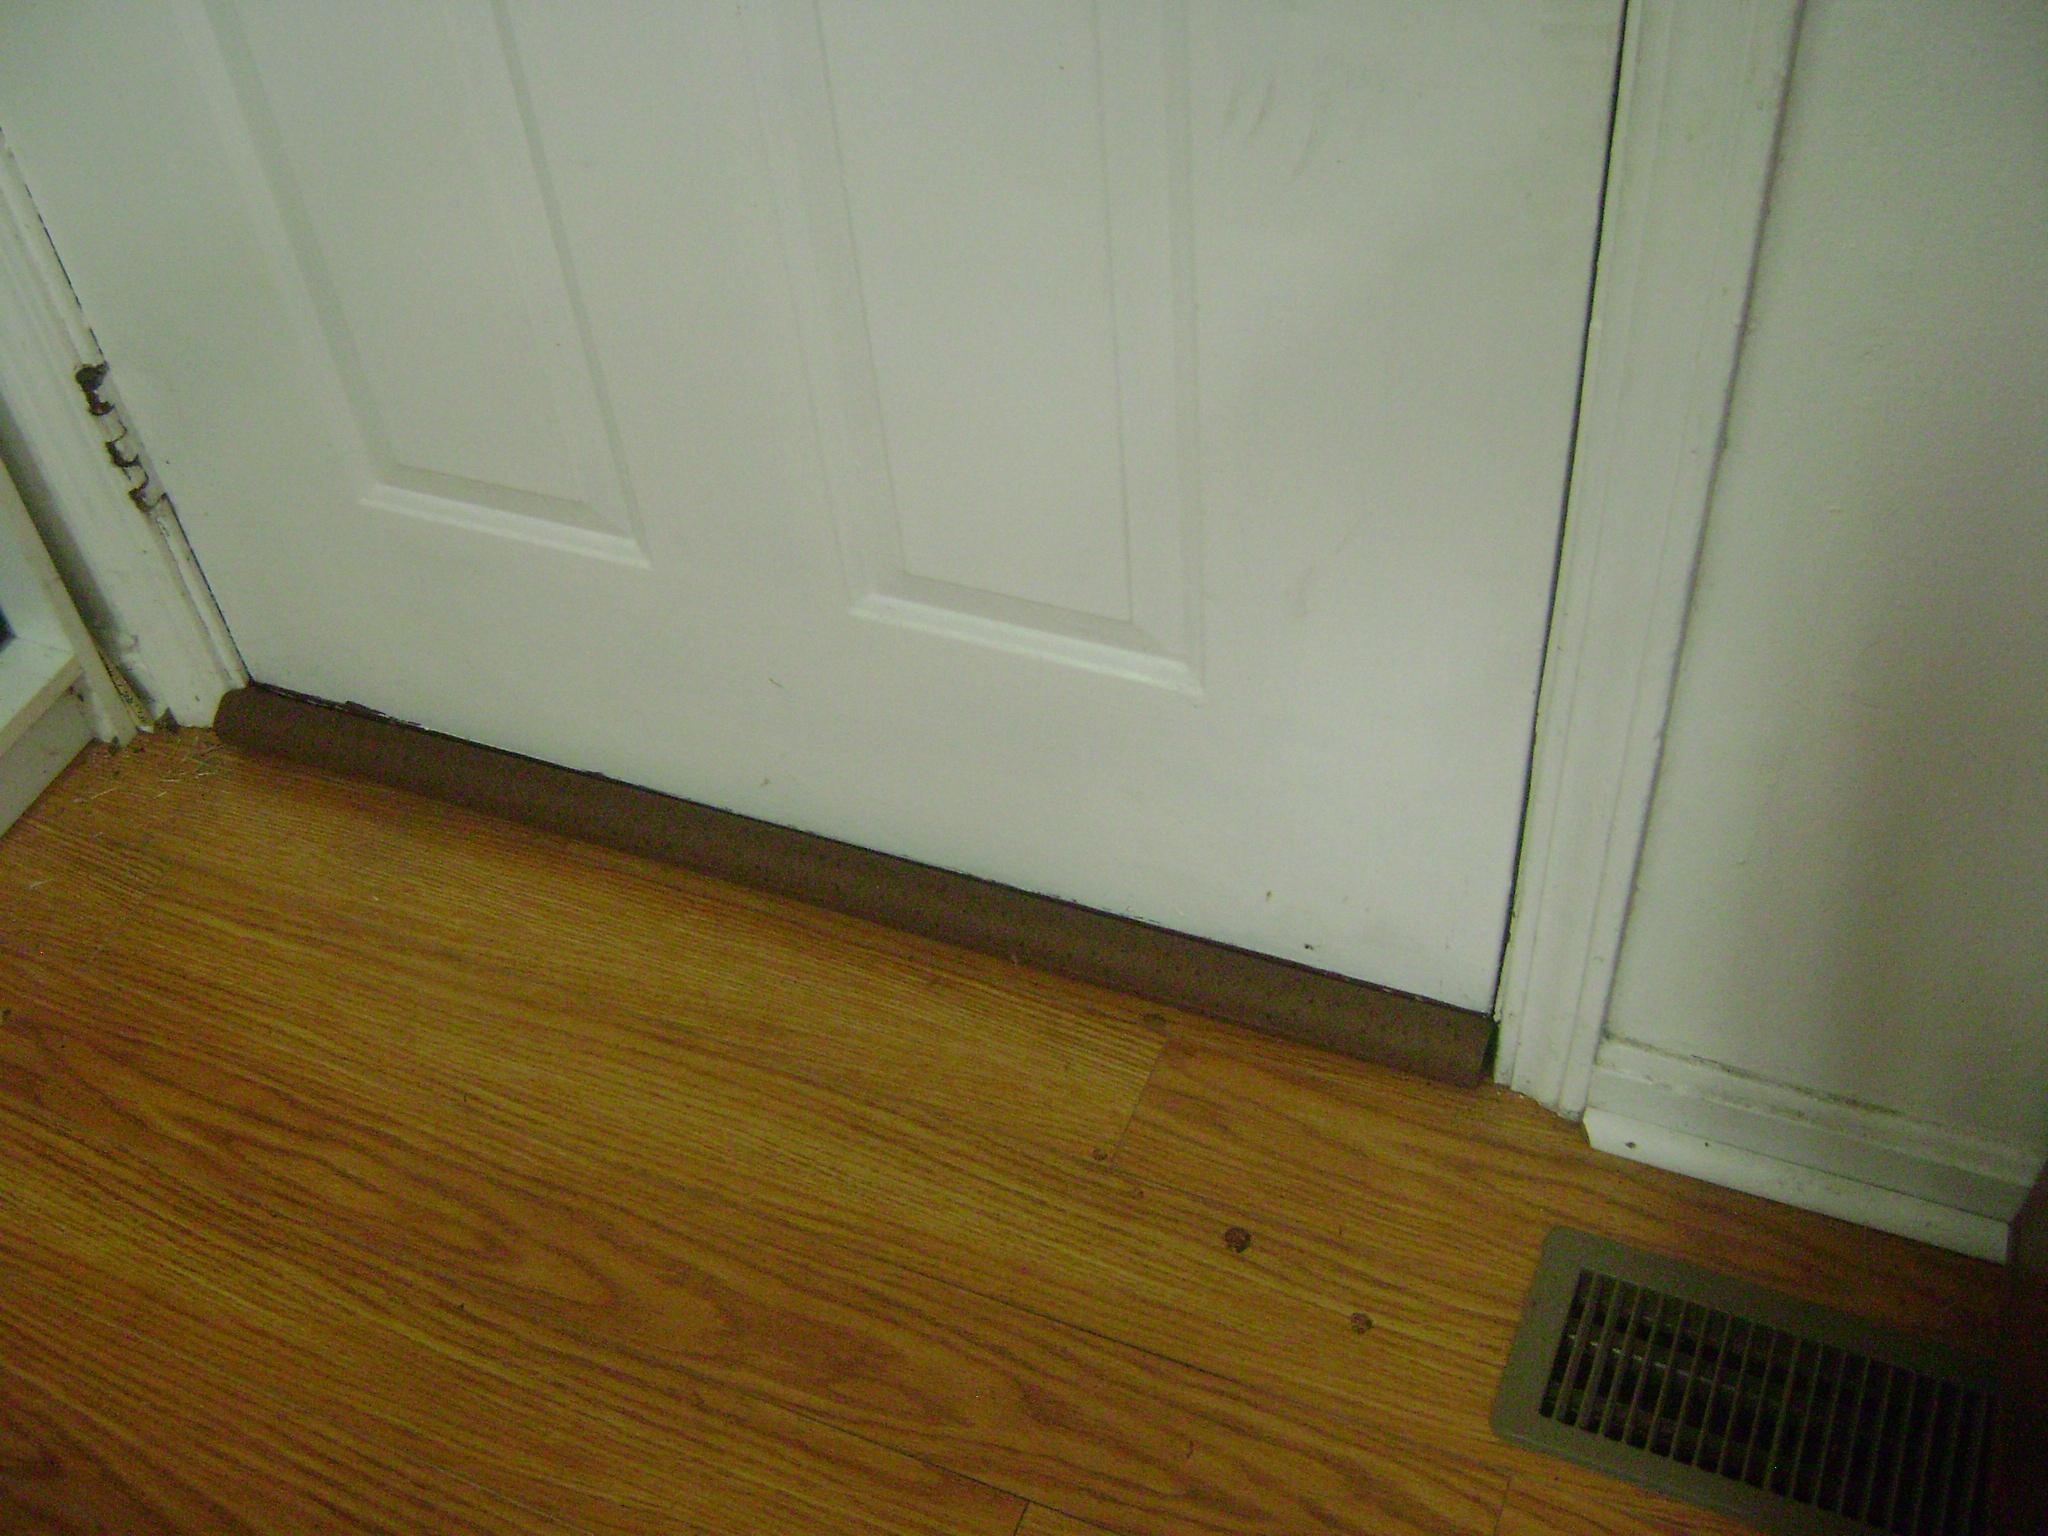 ... 1536 in Door snakes & DOOR SNAKES 2013 018 | Na Na pinches her pennies (aka frugal living)